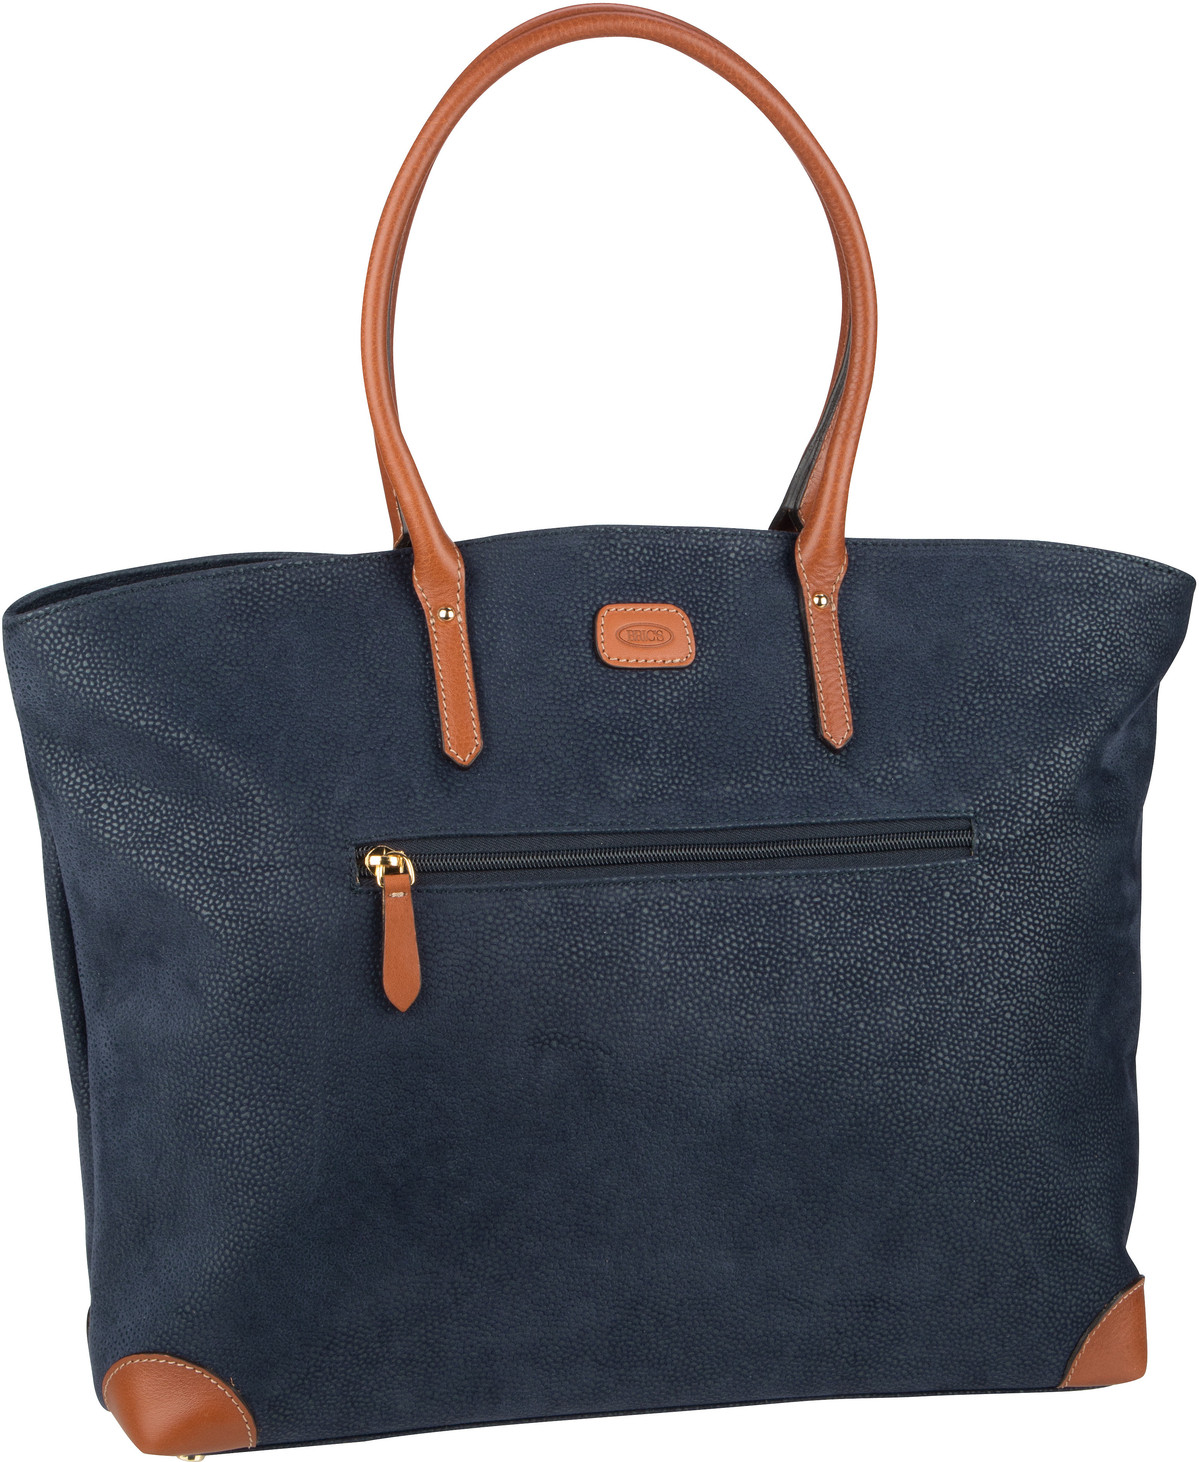 's Handtasche Life Damentasche 53330 Blu